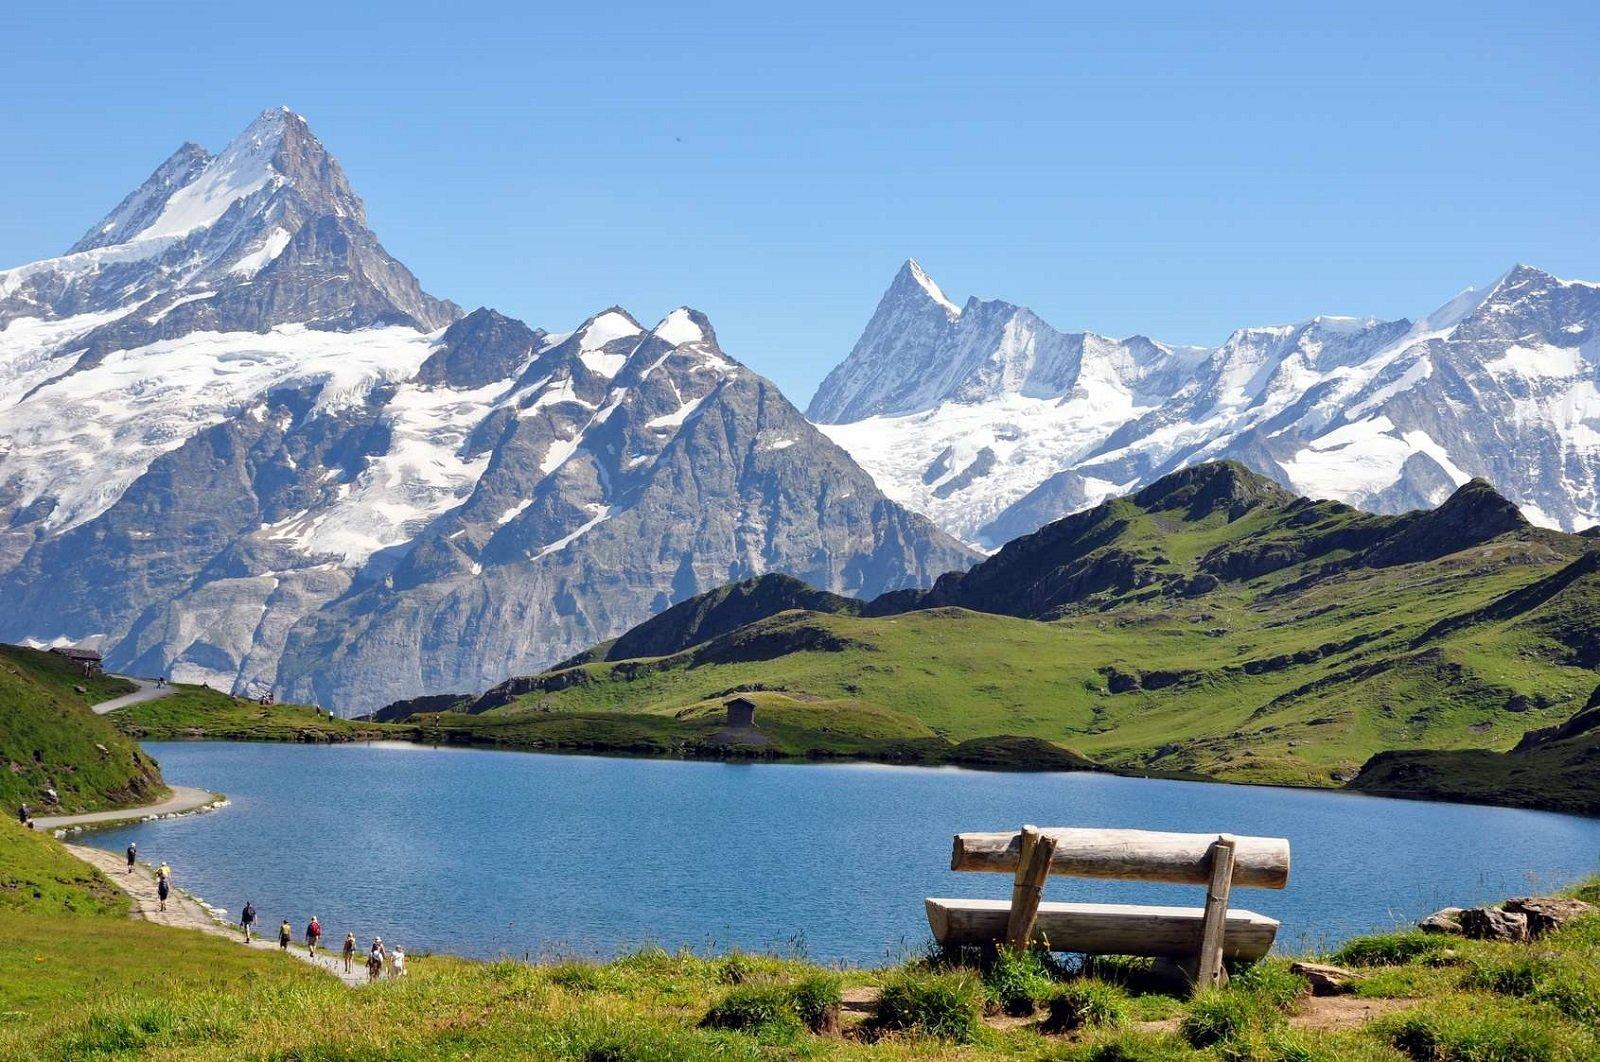 paesaggio di lago e mantagne verdi ed innevate